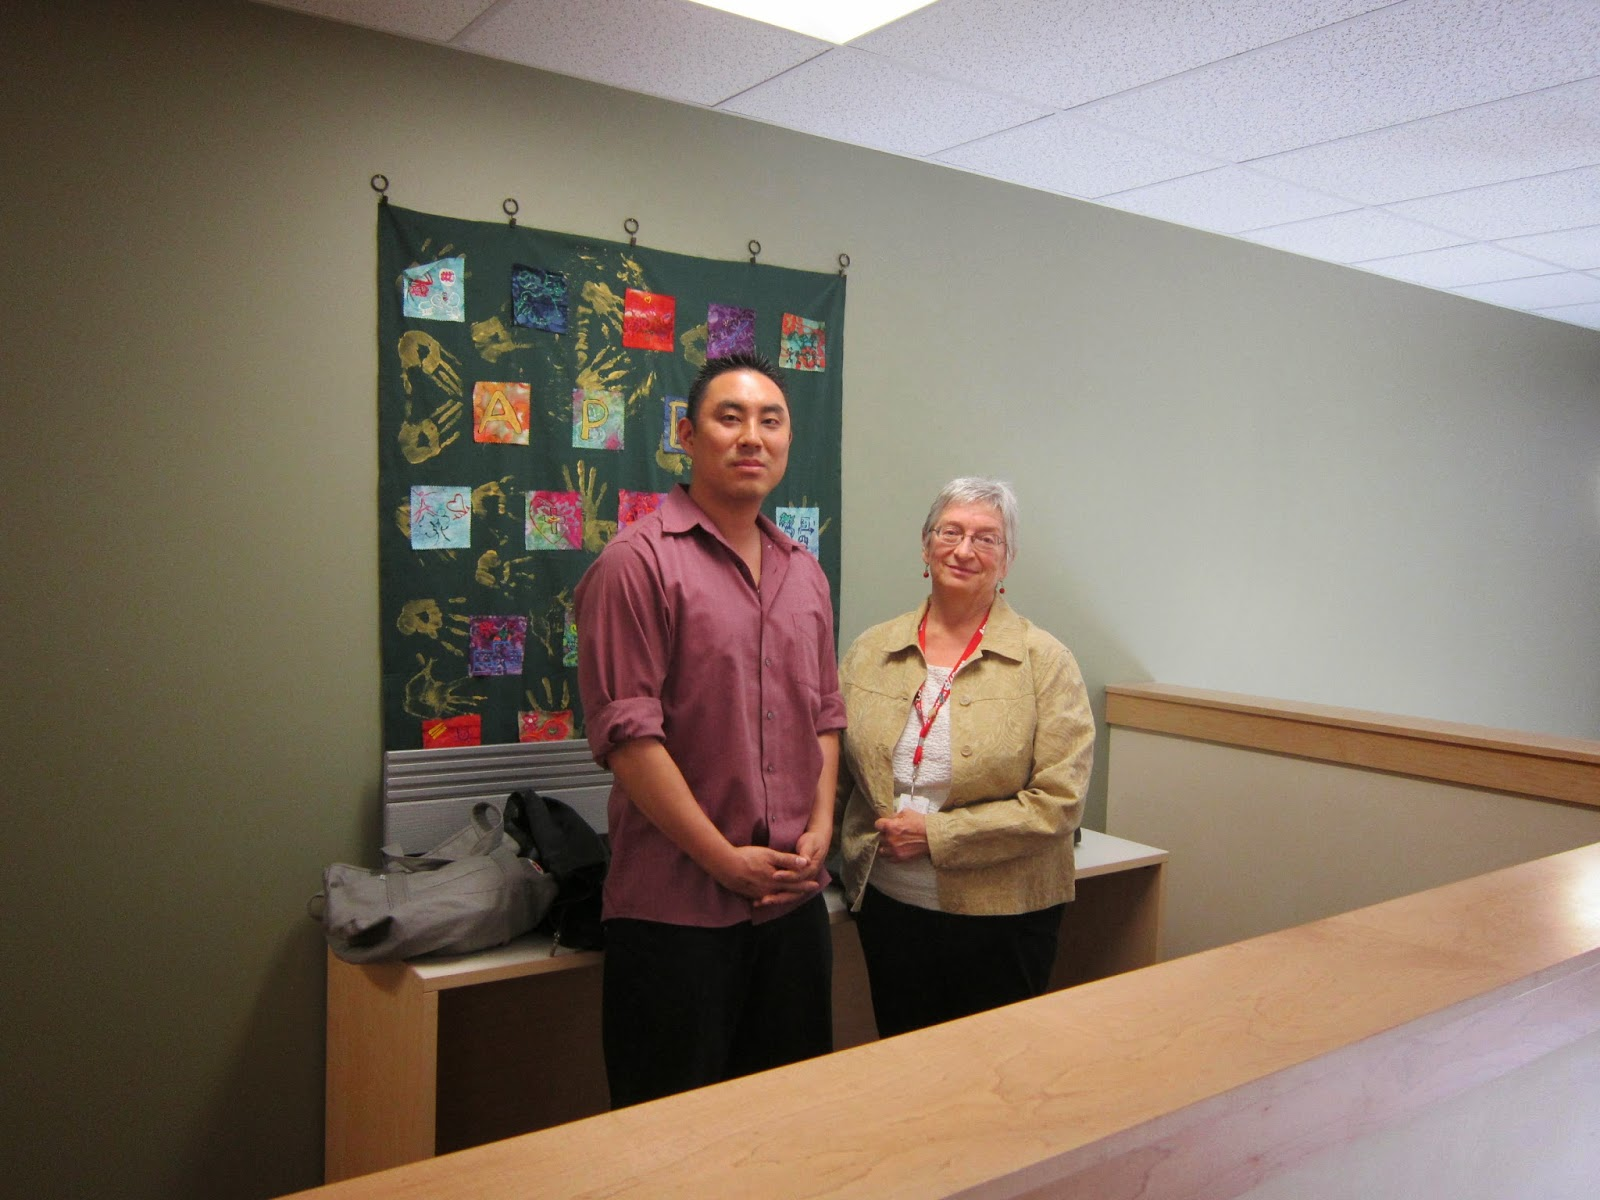 robbe sokolove stands beside member of asian pacific development center in denver